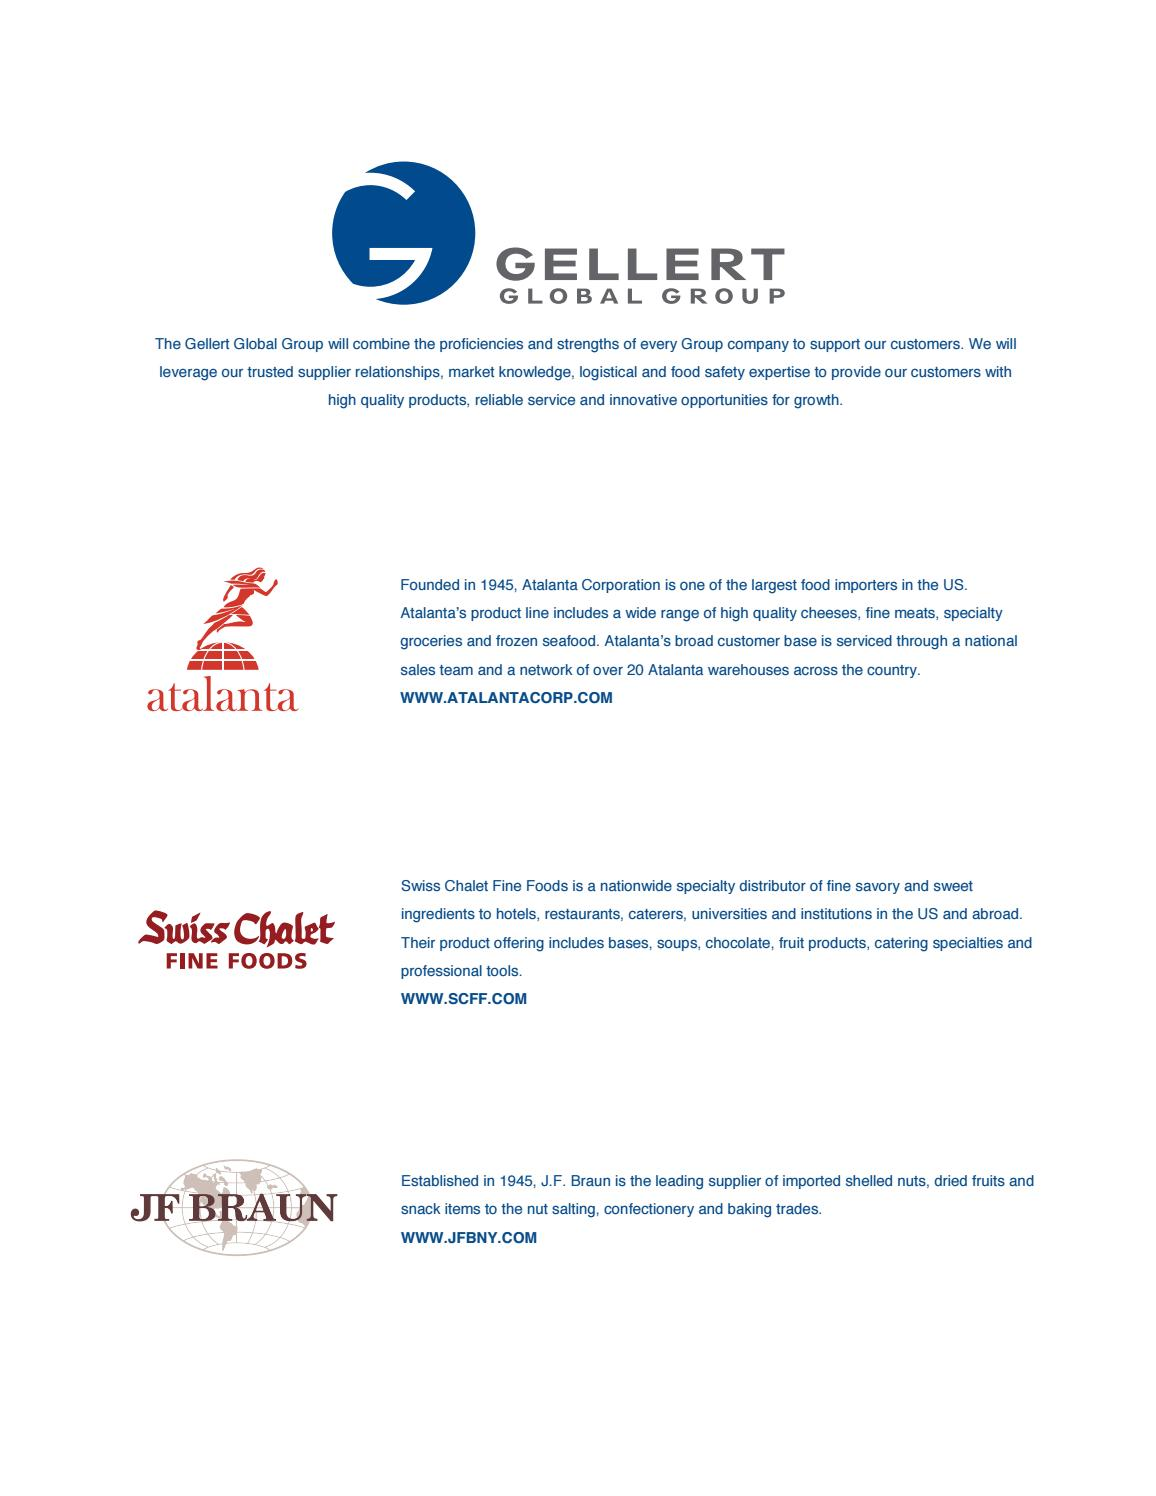 GGG Bakery Guide by Atalanta Corp  - issuu